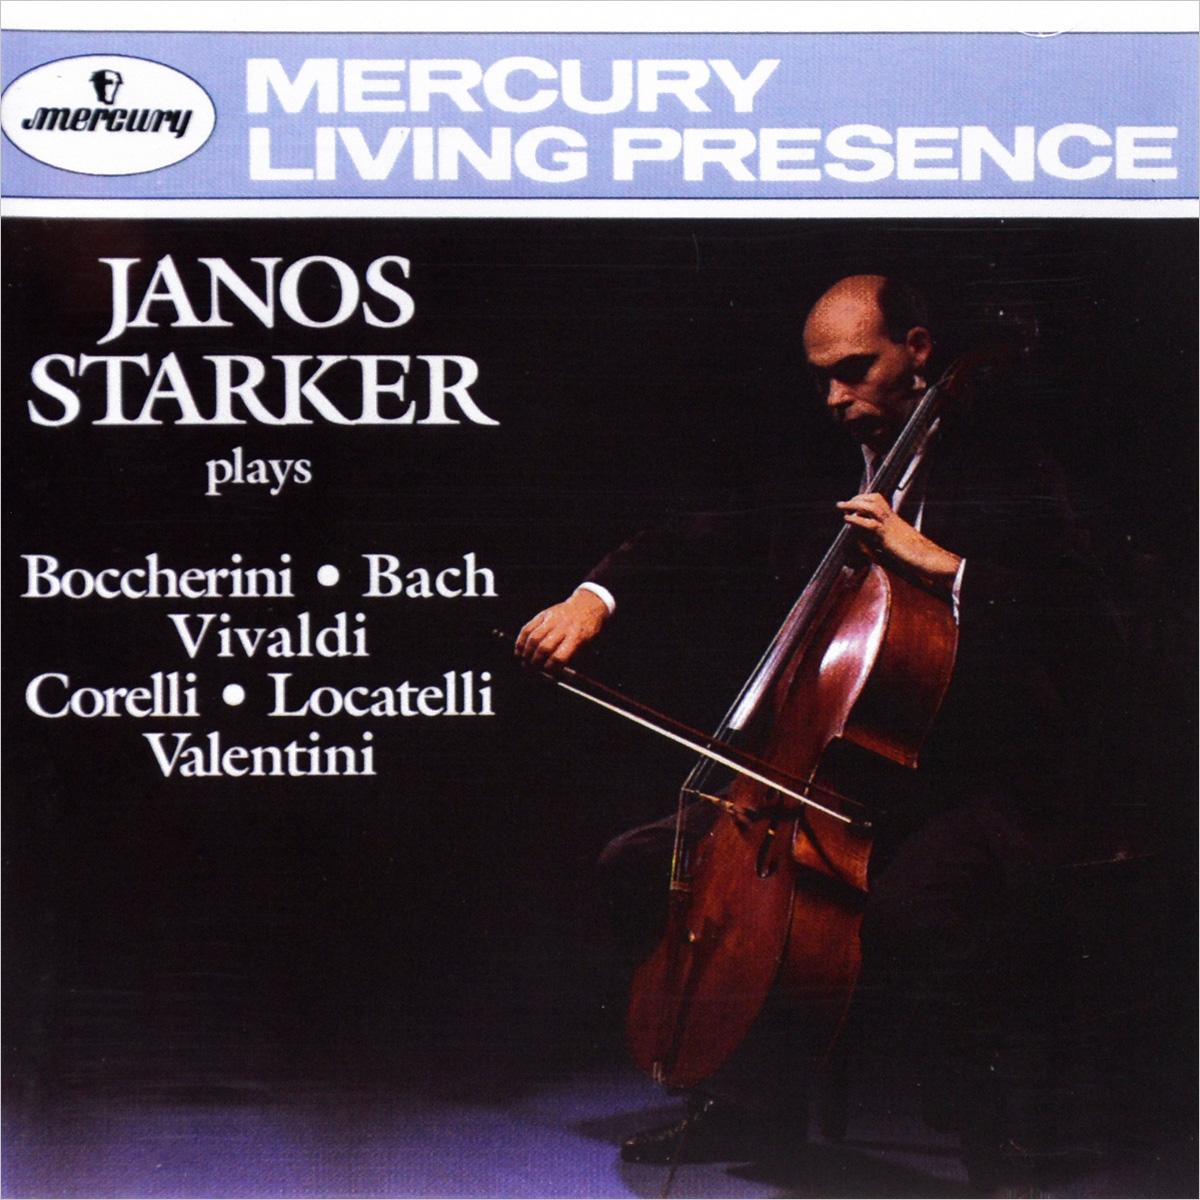 Янос Старкер,Стивен Шведиш Janos Starker. Boccherini / Bach / Vivaldi / Corelli / Locatelli / Valentini various boccherini luigi sonates